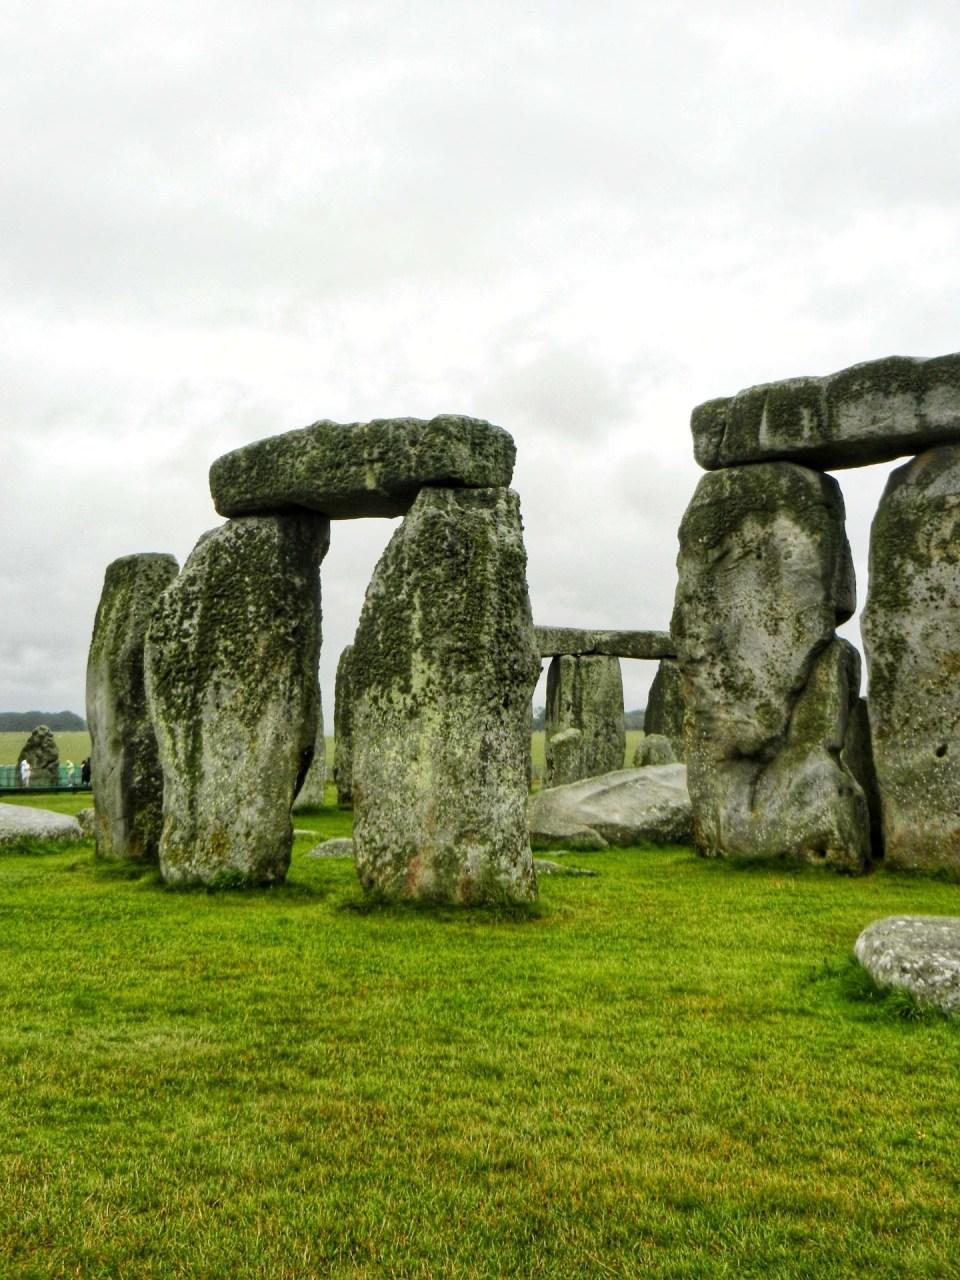 fromthecornertable, travelblog, travelblogger, england, englandcities, englandtowns, englandvillages, english, unitedkingdom, travelengland, travelUK, things-to-see, must-see-england, must-visit-england, stonehenge, unesco, worldheritagesite